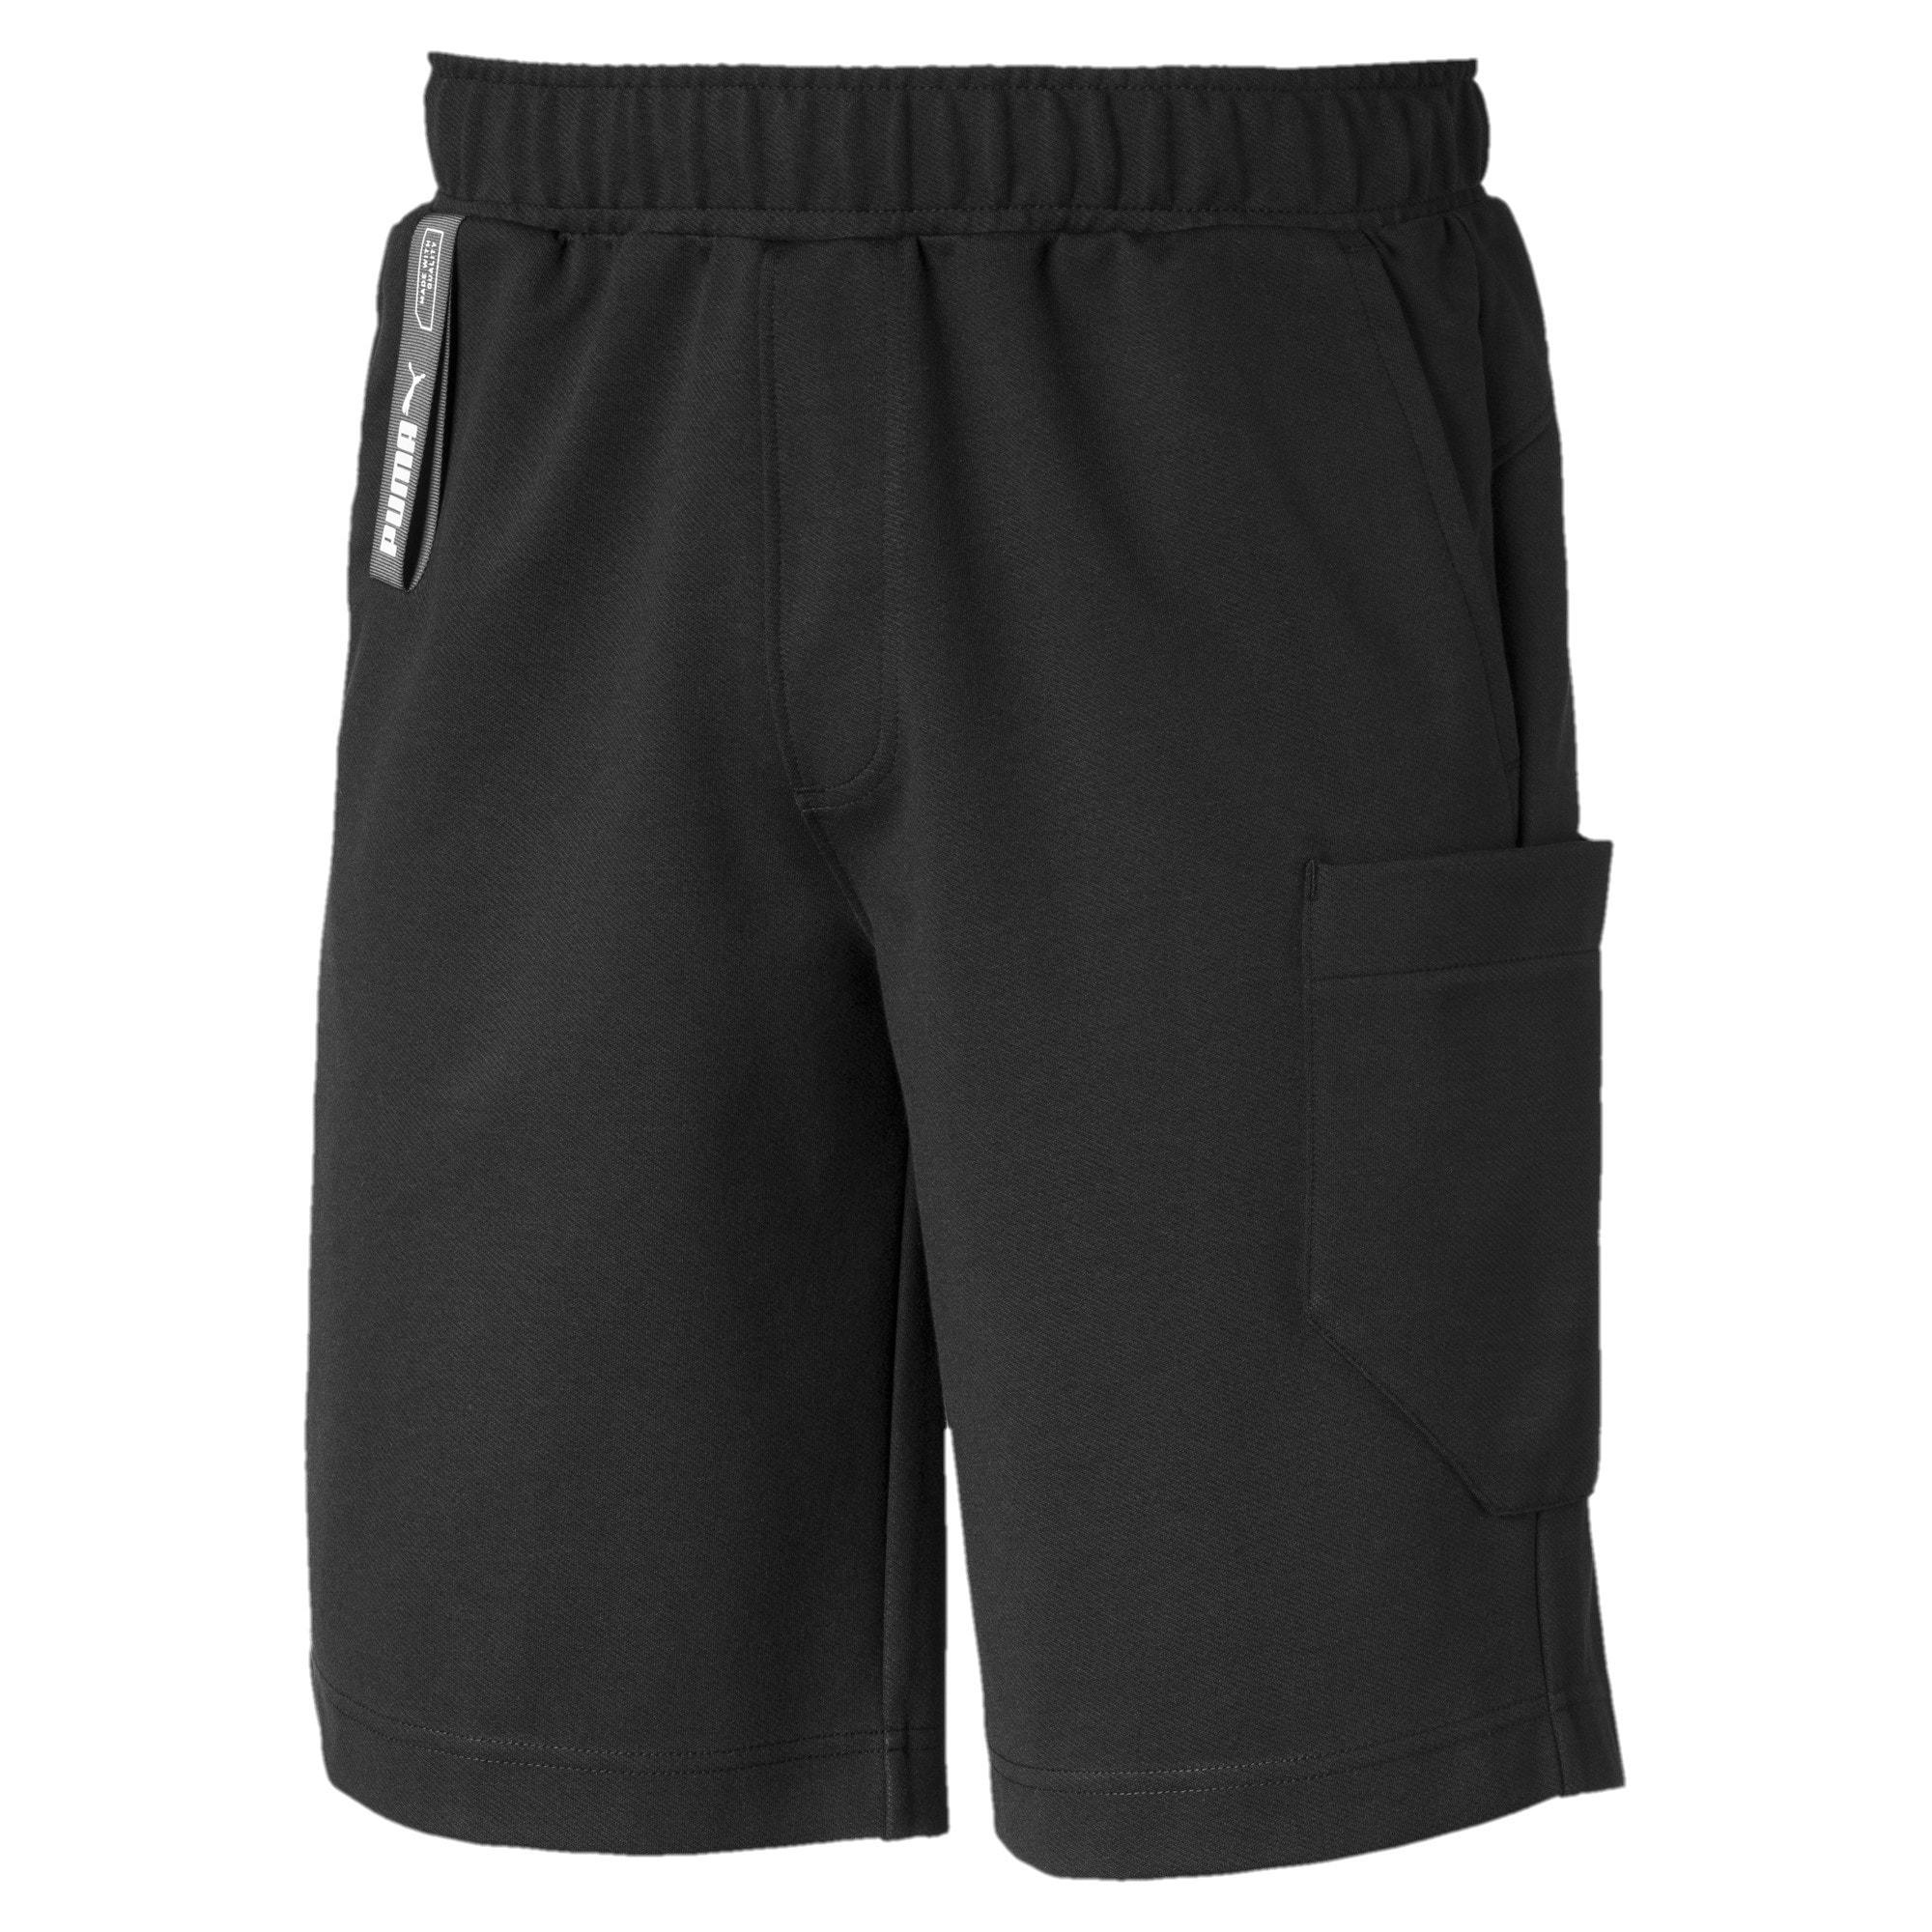 Thumbnail 4 of NU-TILITY Men's Shorts, Puma Black, medium-IND